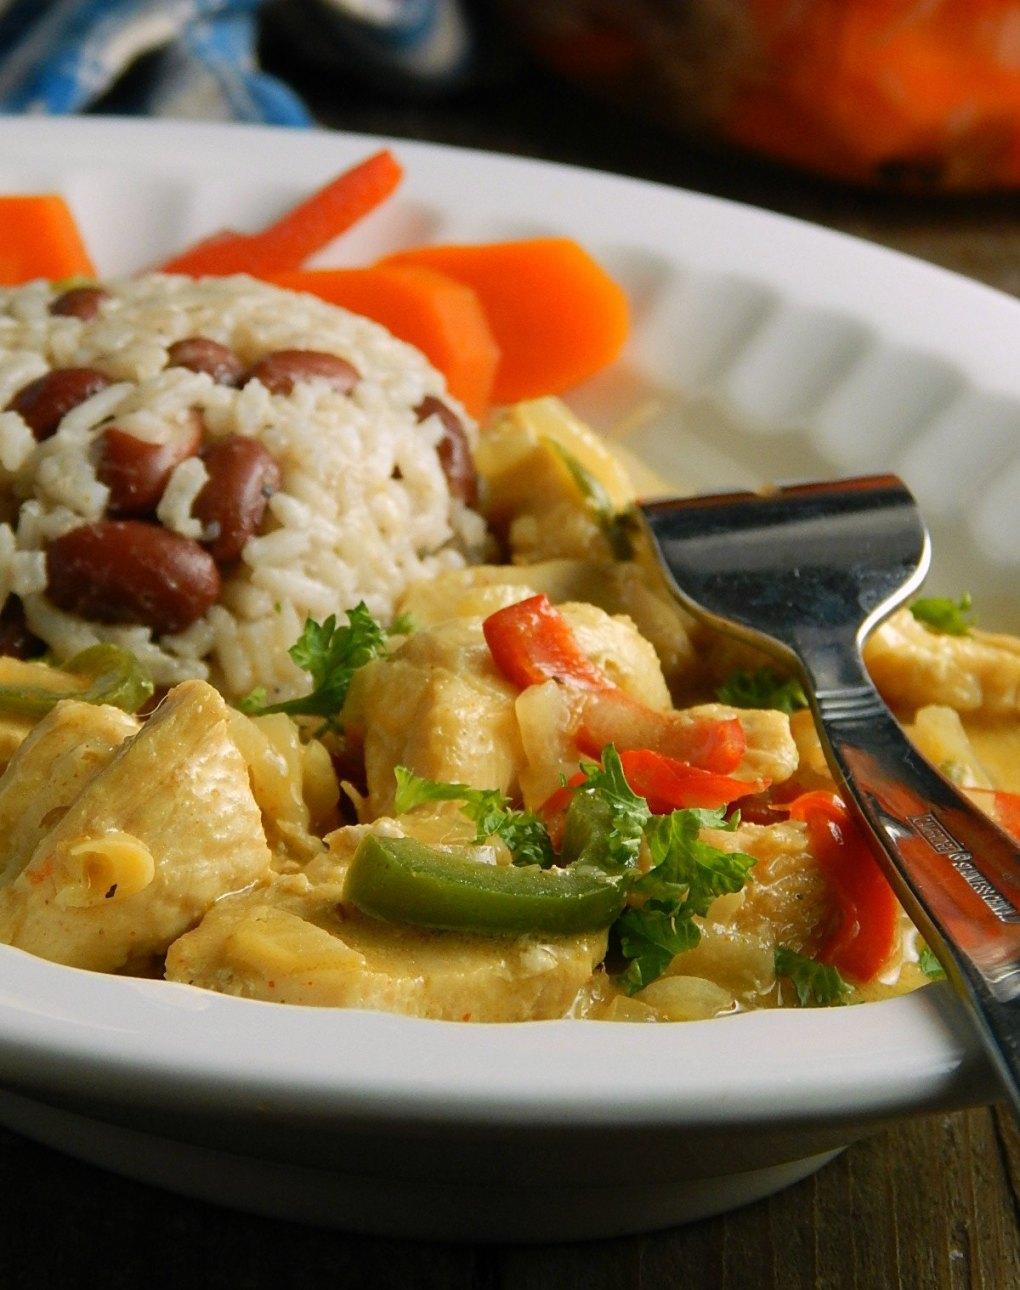 Pollo en Leche de Coco - Guatemalan Chicken in Coconut Milk with Rice & Beans